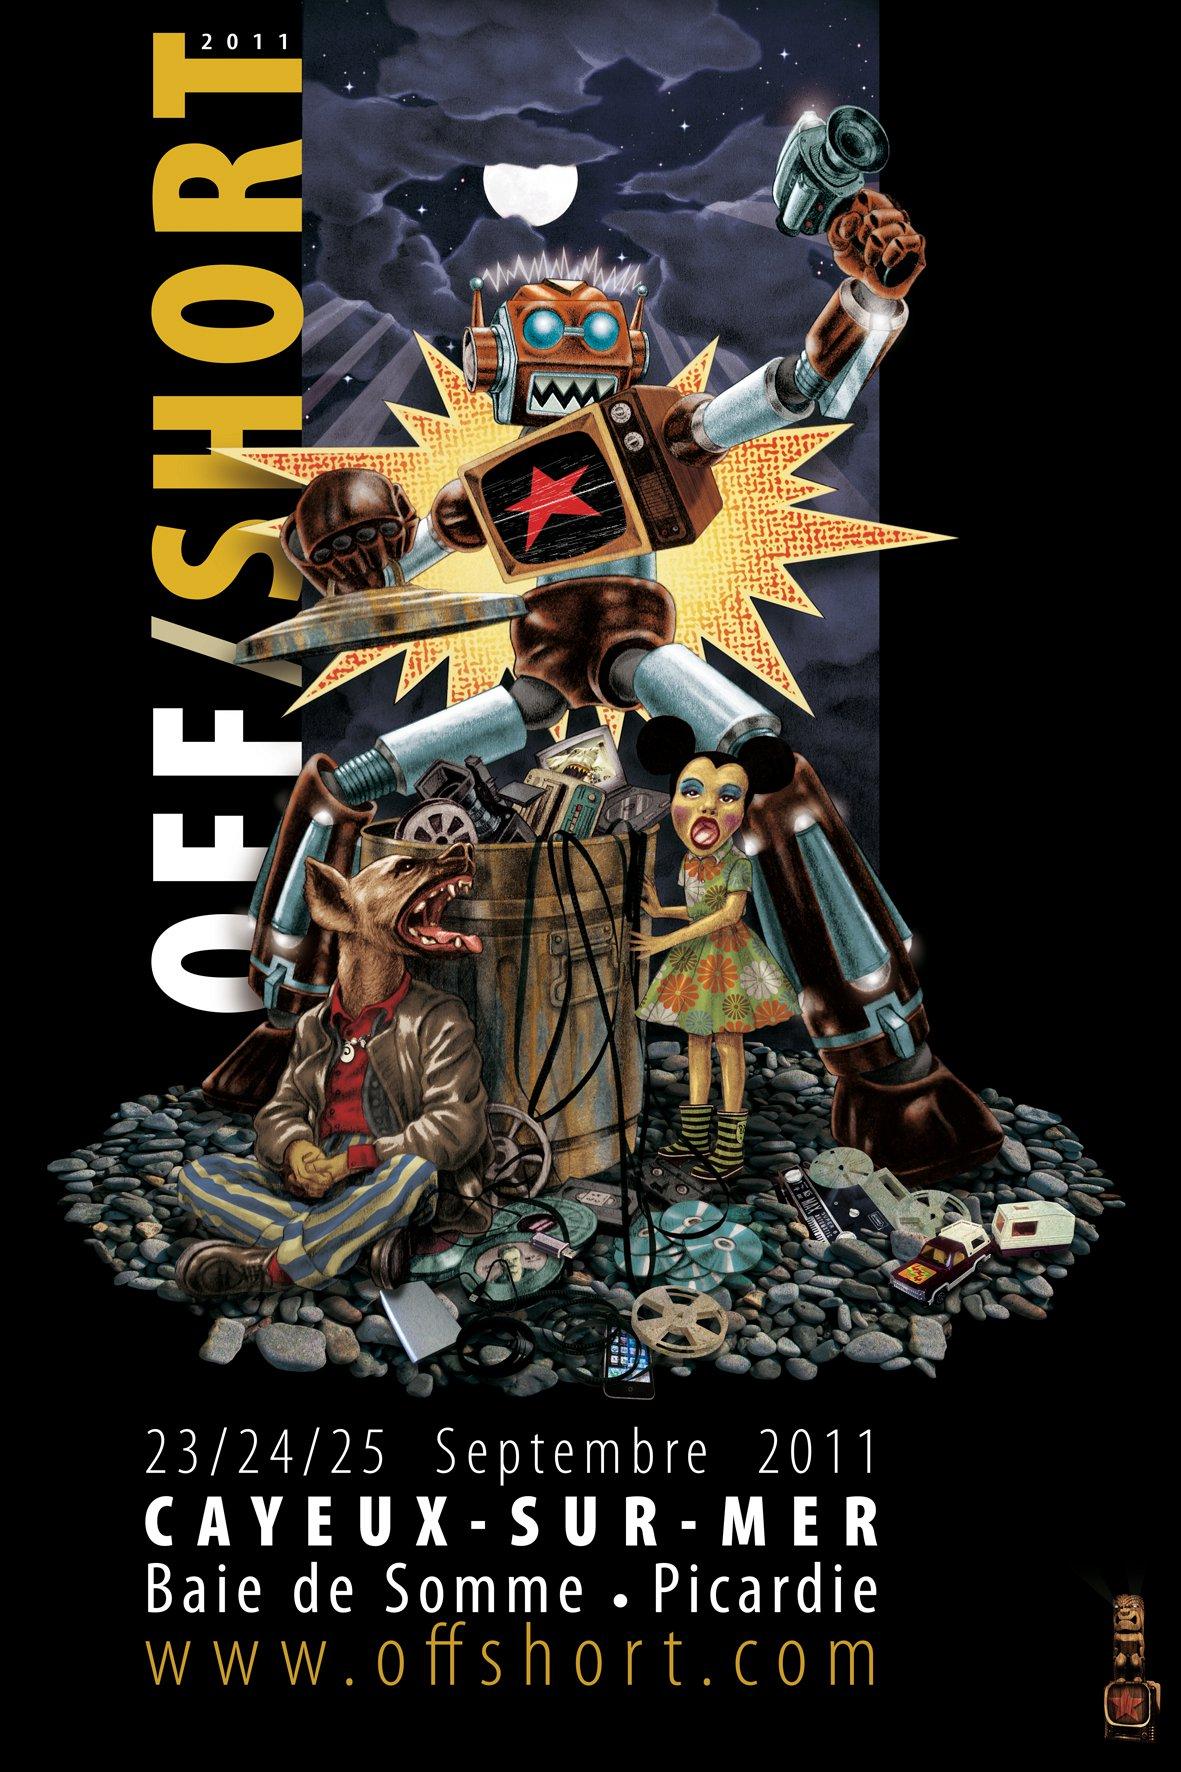 23, 24, 25 septembre 2011 – Offshort : Sticky Soumka en Picardie !